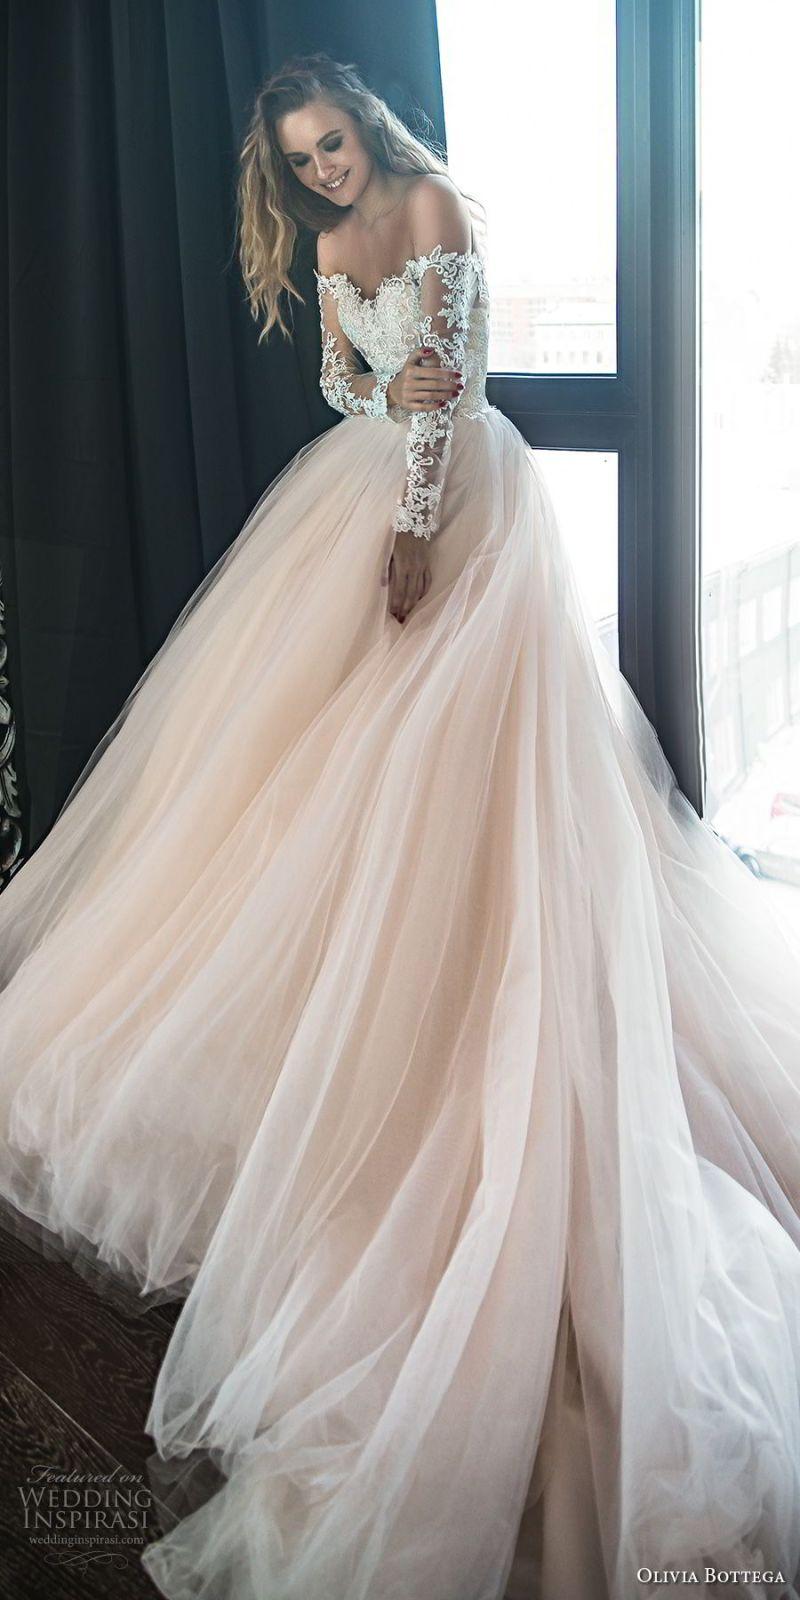 olivia bottega 2018 bridal long sleeves off the shoulder sweetheart neckline heavily embellished bodice princess romantic blush ball gown wedding dress royal train (1) mv